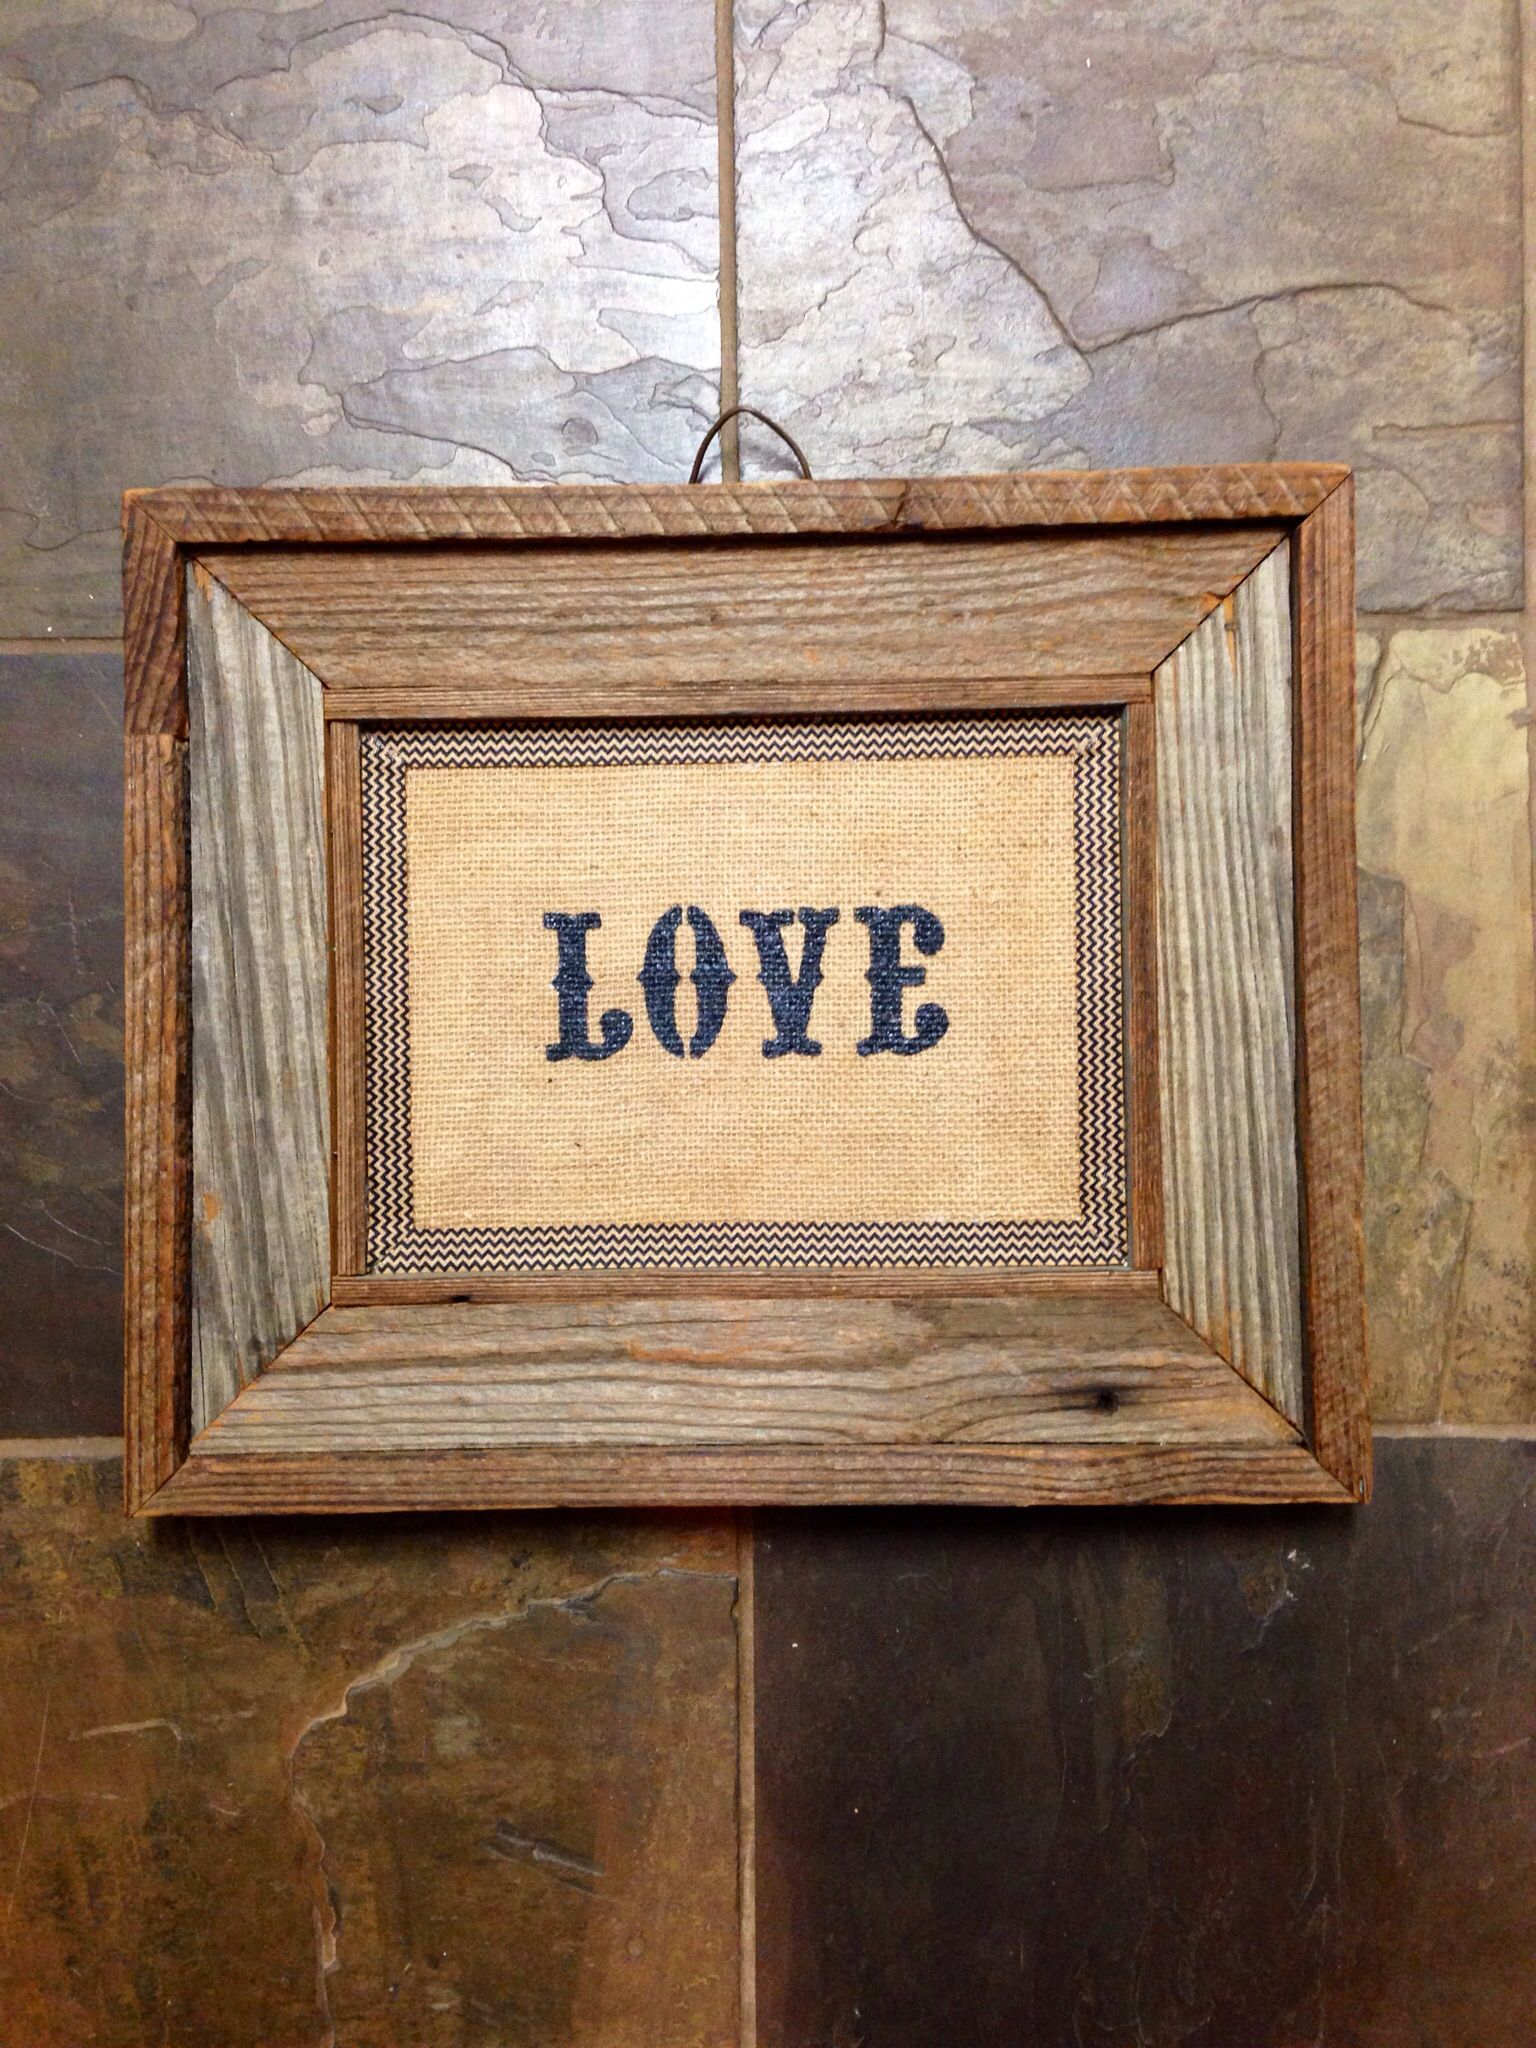 LOVE on burlap with chevron ribbon mat in barn wood frame | Barnwood ...